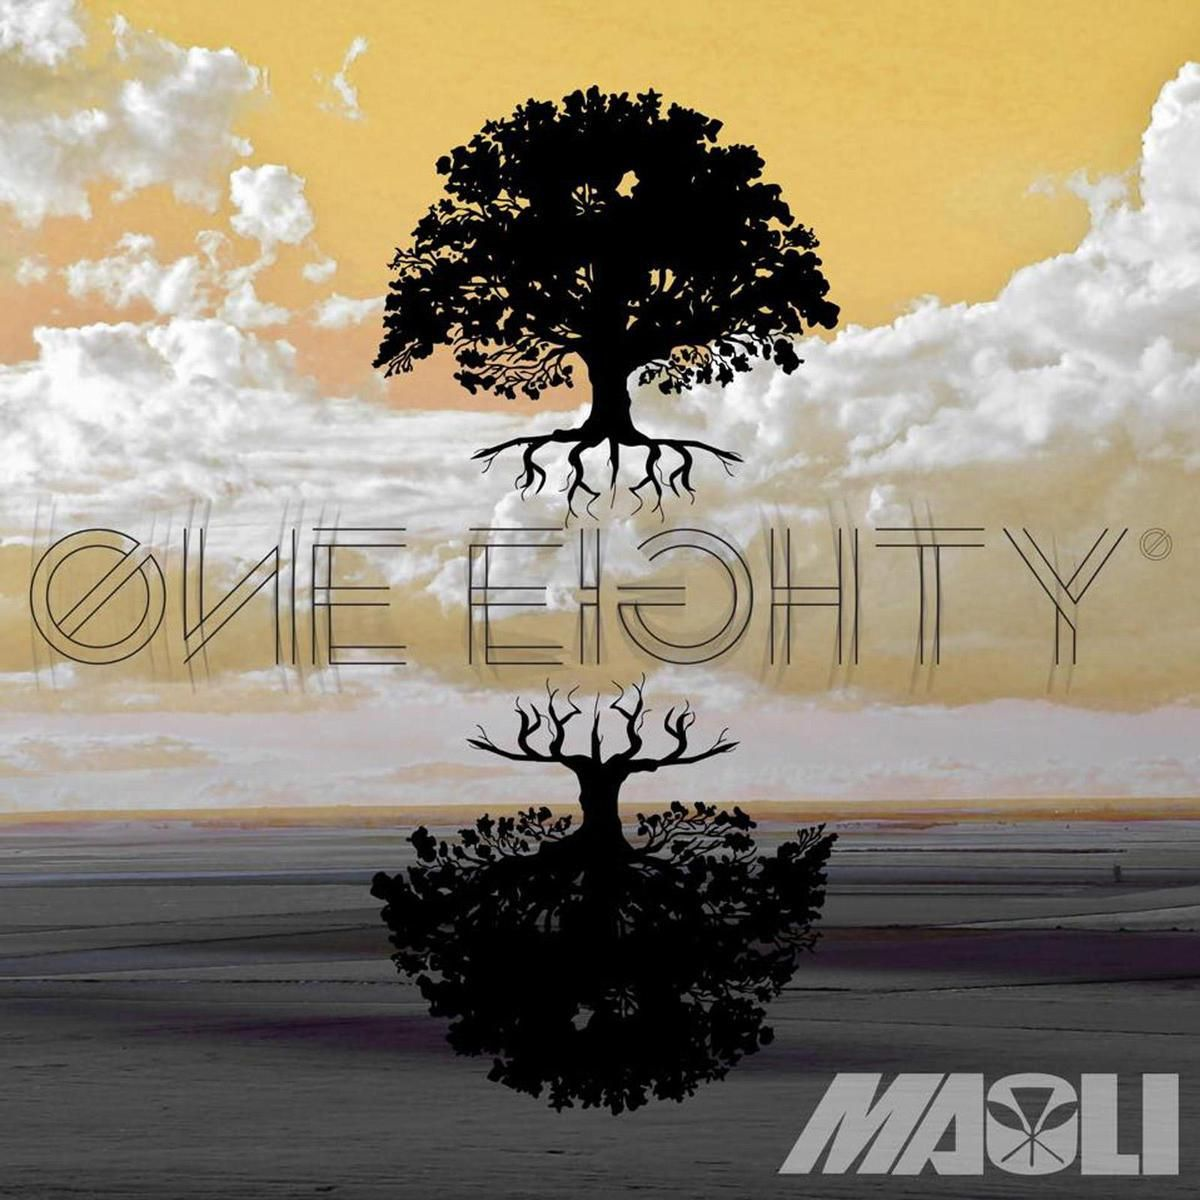 RasCopeRoots and Reggae: Maoli – One Eighty  (2015)